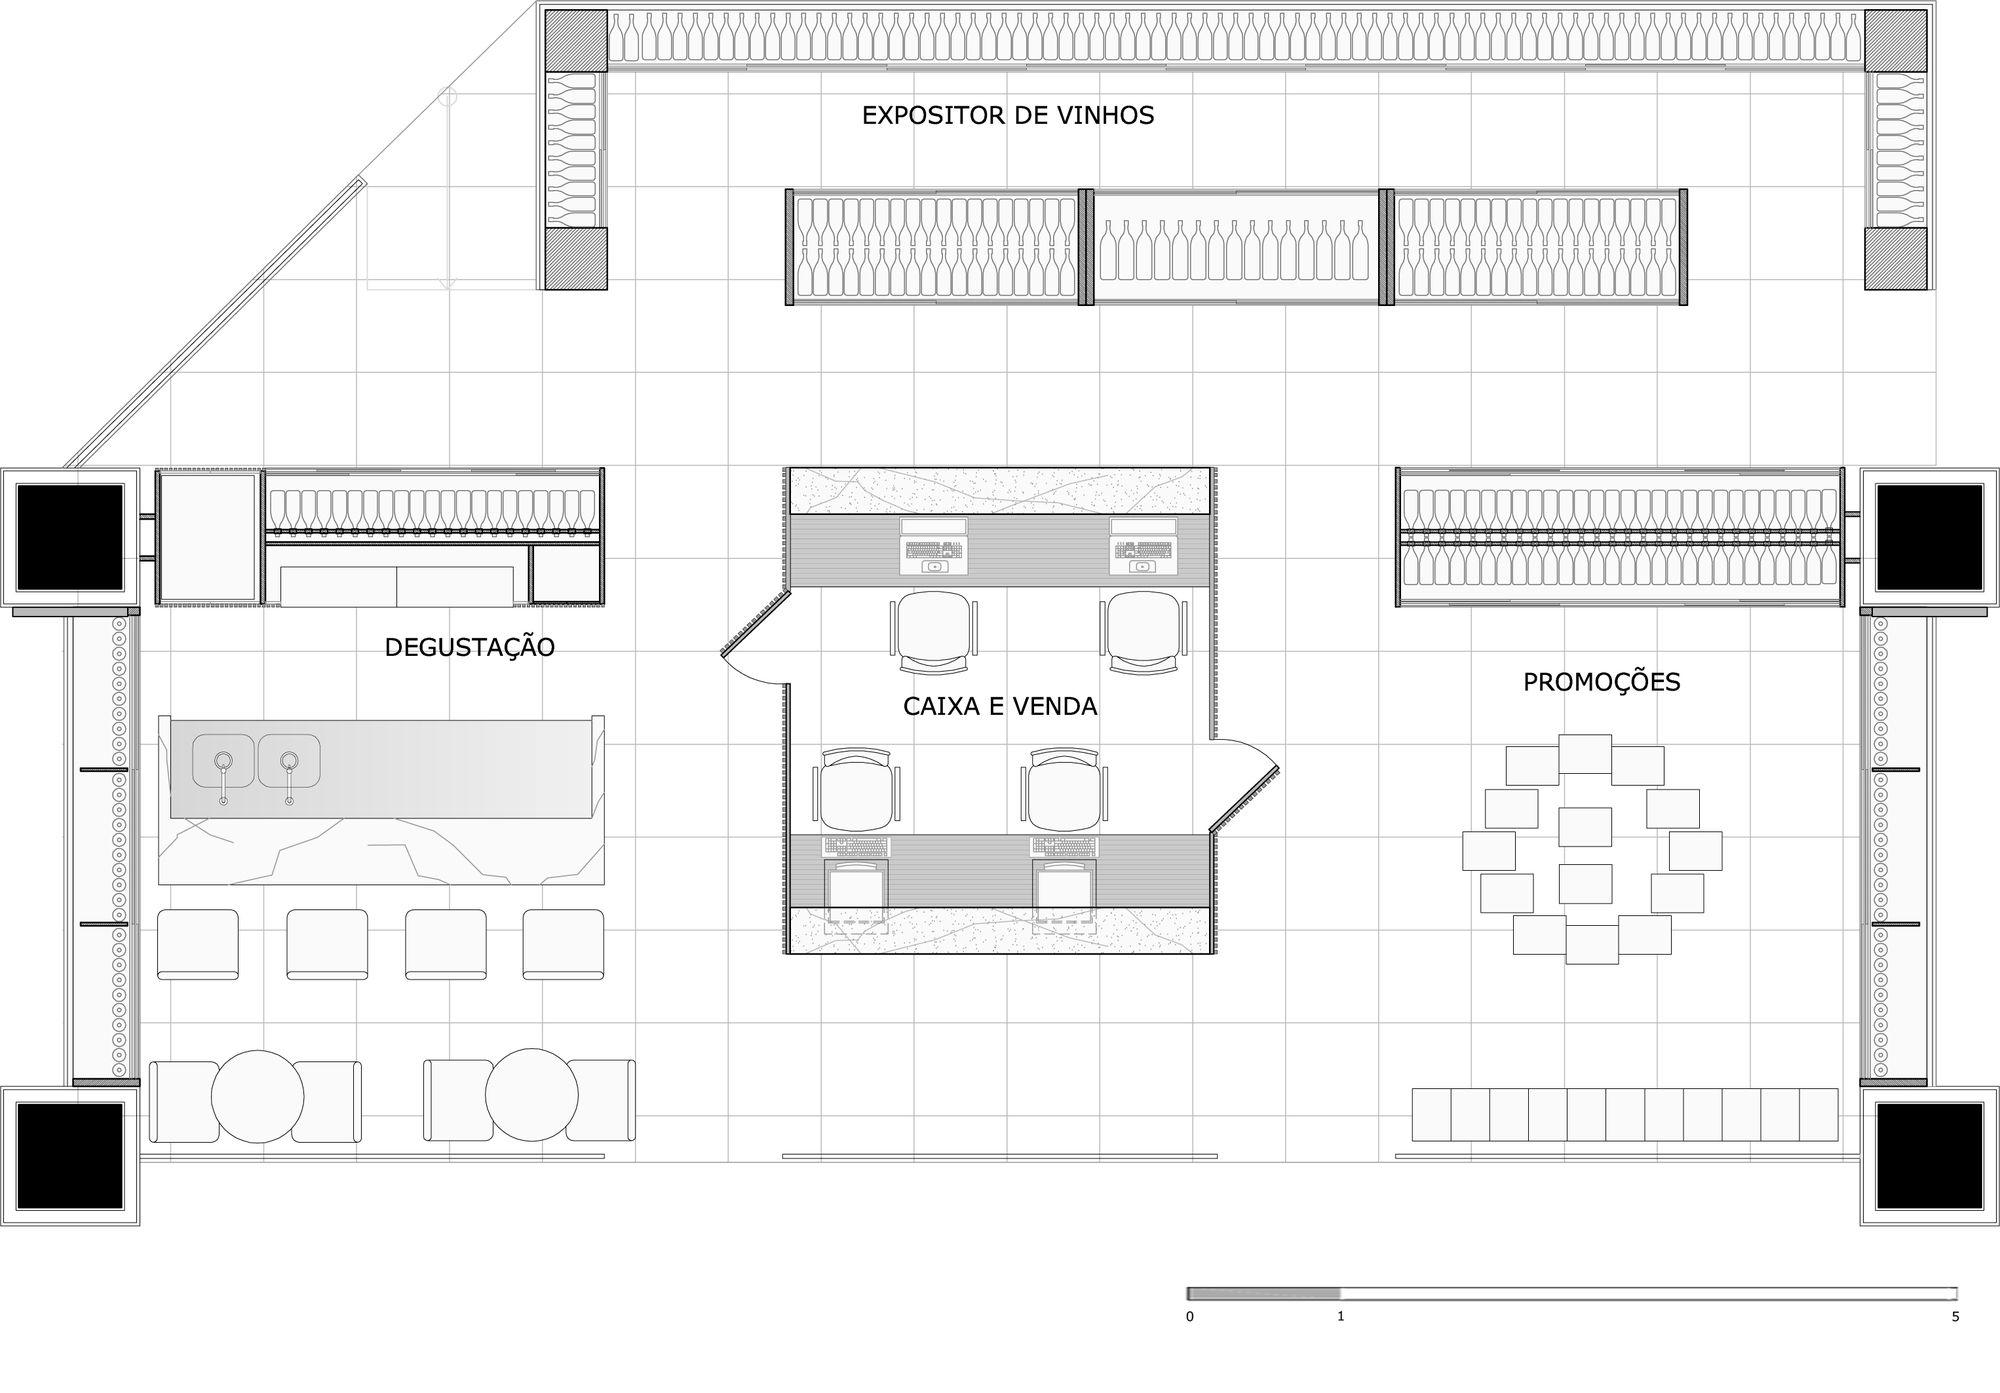 Enoteca World Wine Fasano / a:m studio de arquitetura